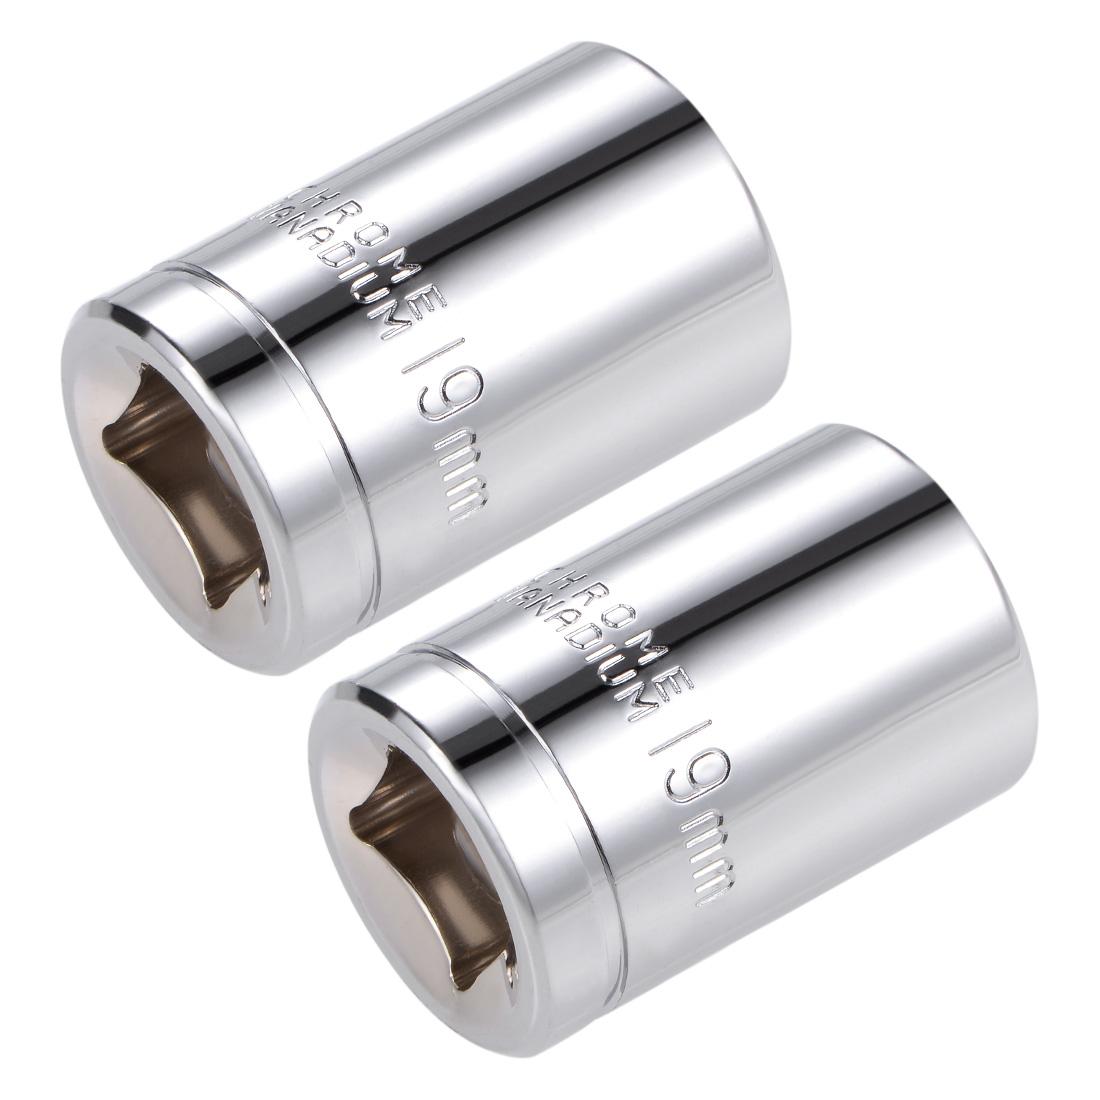 1/2-inch Drive E19 Universal Spline Socket Shallow 12 Point Cr-V Steel 2 Pcs